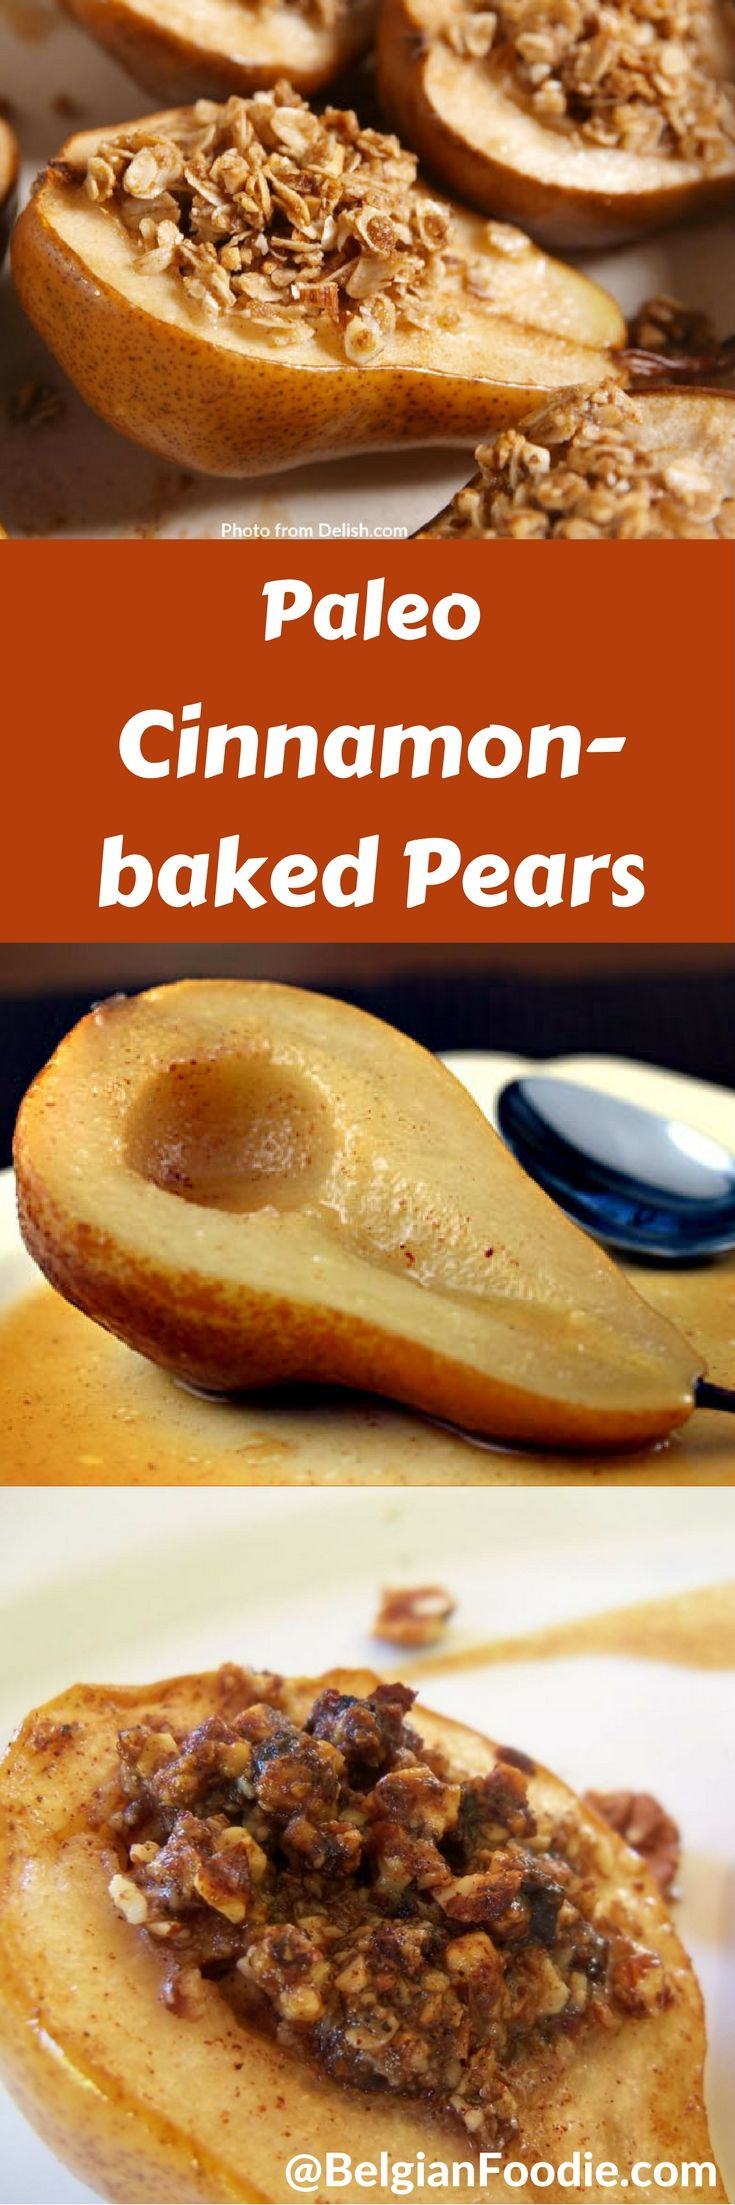 Heart Healthy Baked Chicken Recipes  100 Heart healthy recipes on Pinterest